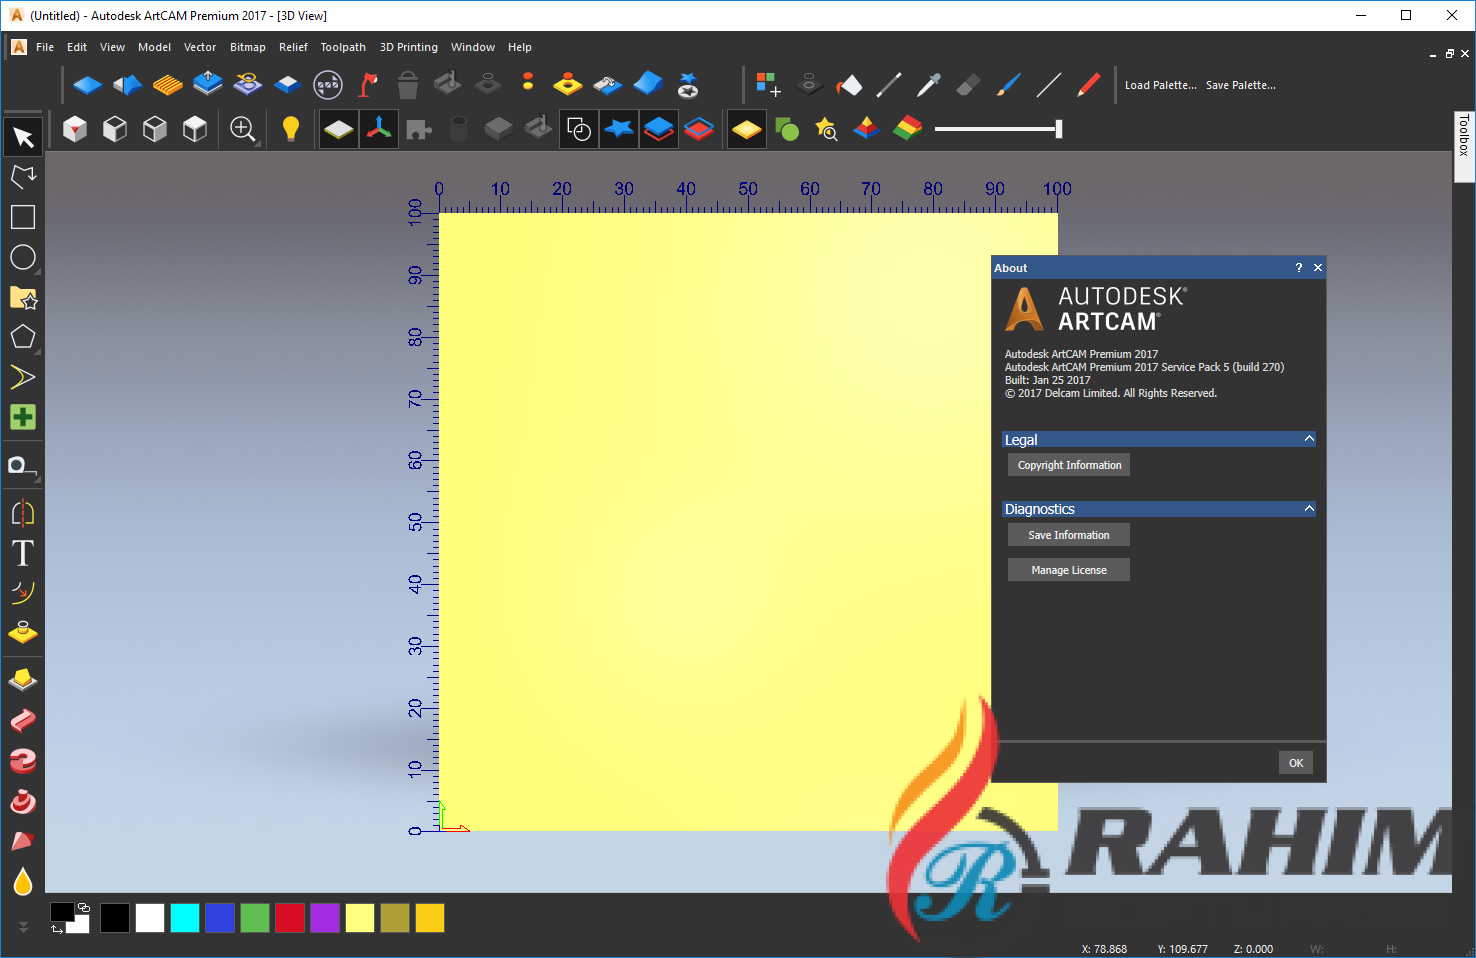 Autodesk ArtCAM 2017 Free Download - Rahim soft